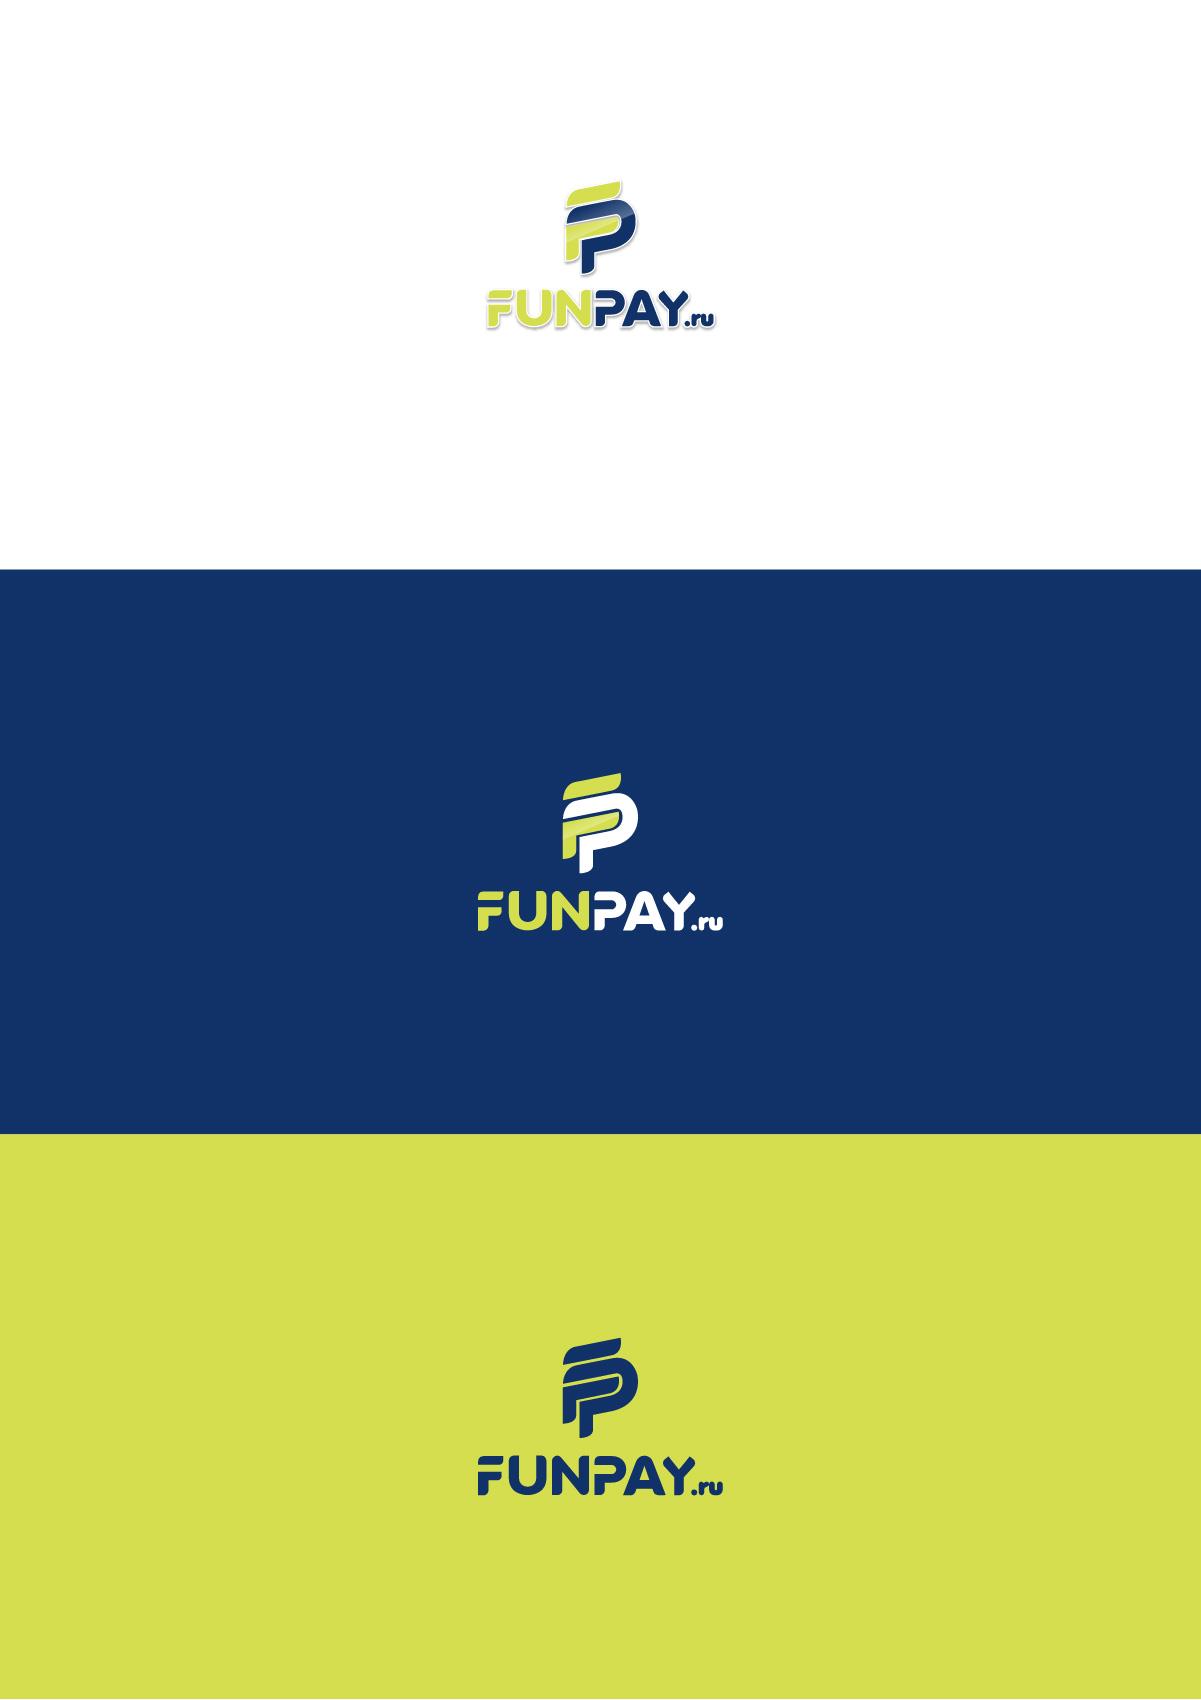 Логотип для FunPay.ru фото f_12759a07de220cc5.jpg